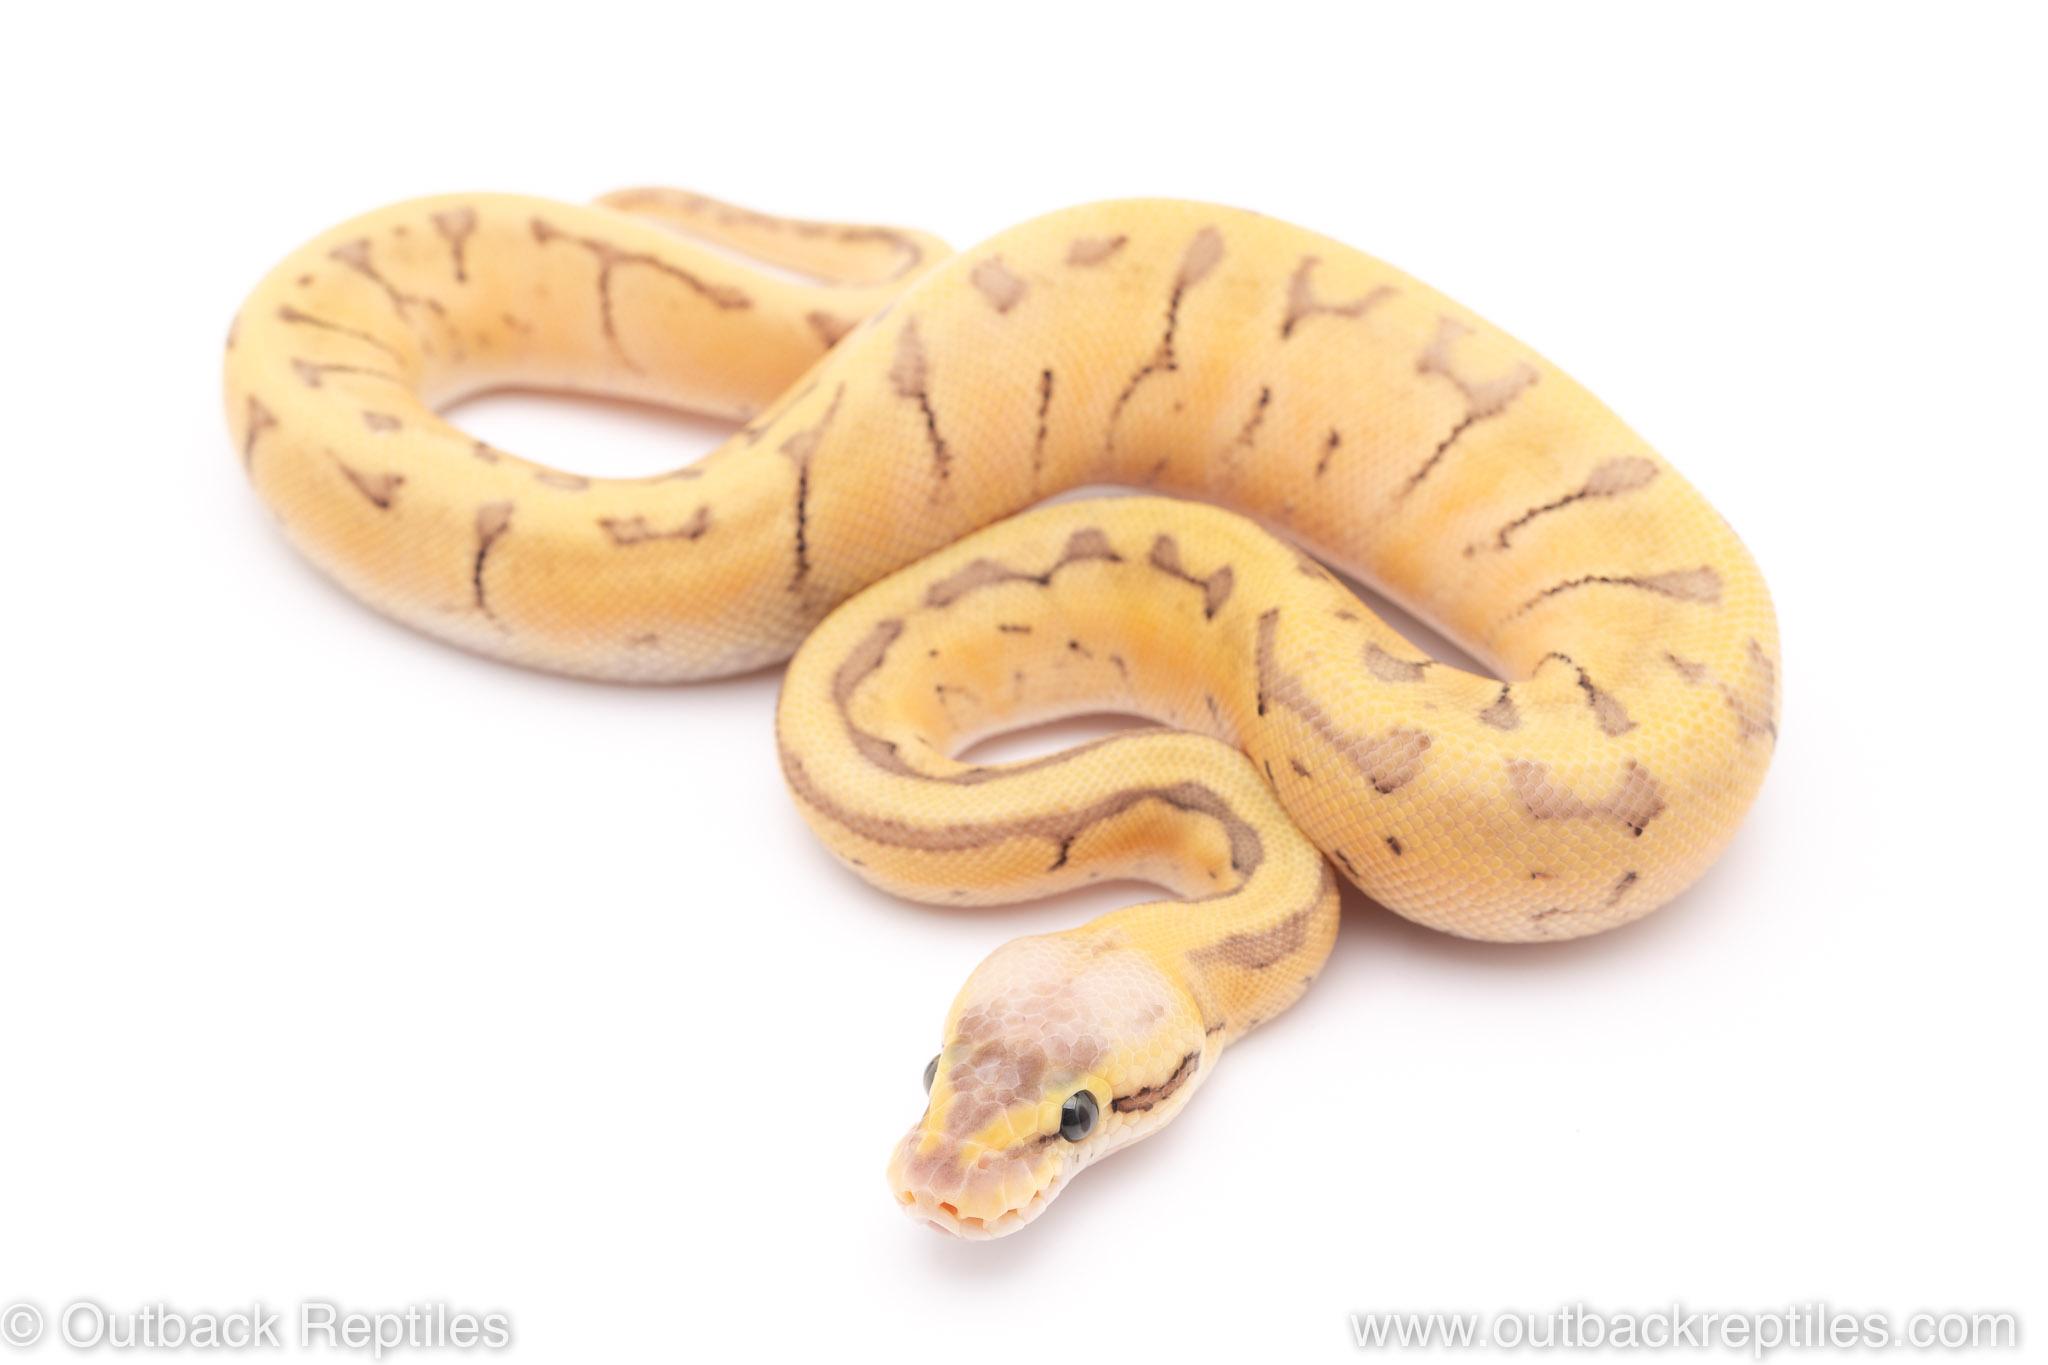 Killer blast enchi lace ball python for sale